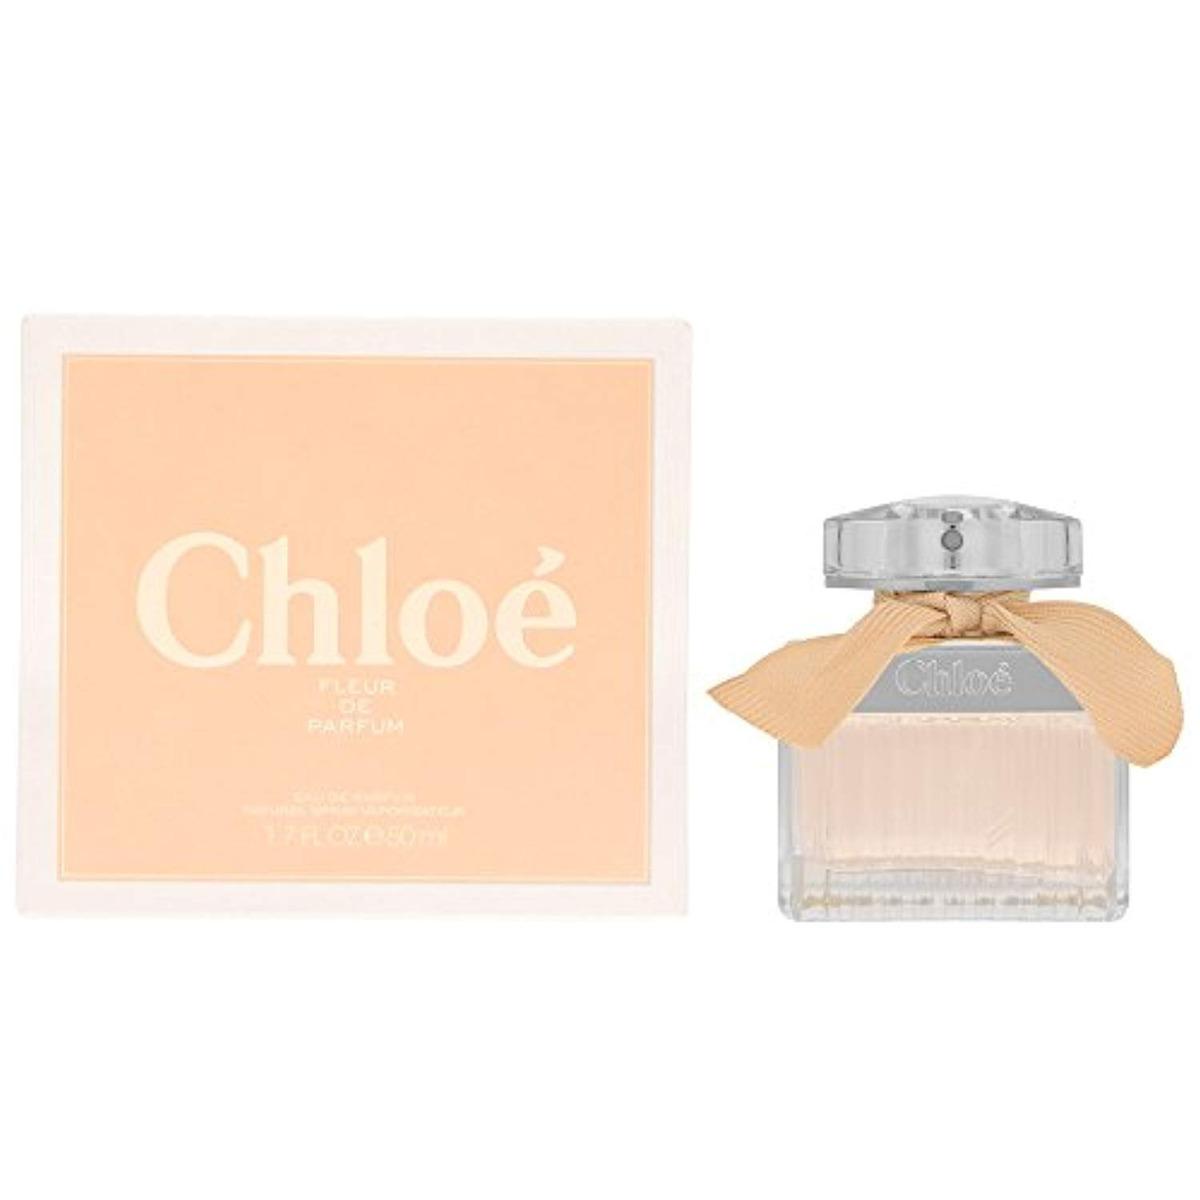 Para Mujeres1 7 Fleur Parfum Chloe De Onzas Tl1JFKc